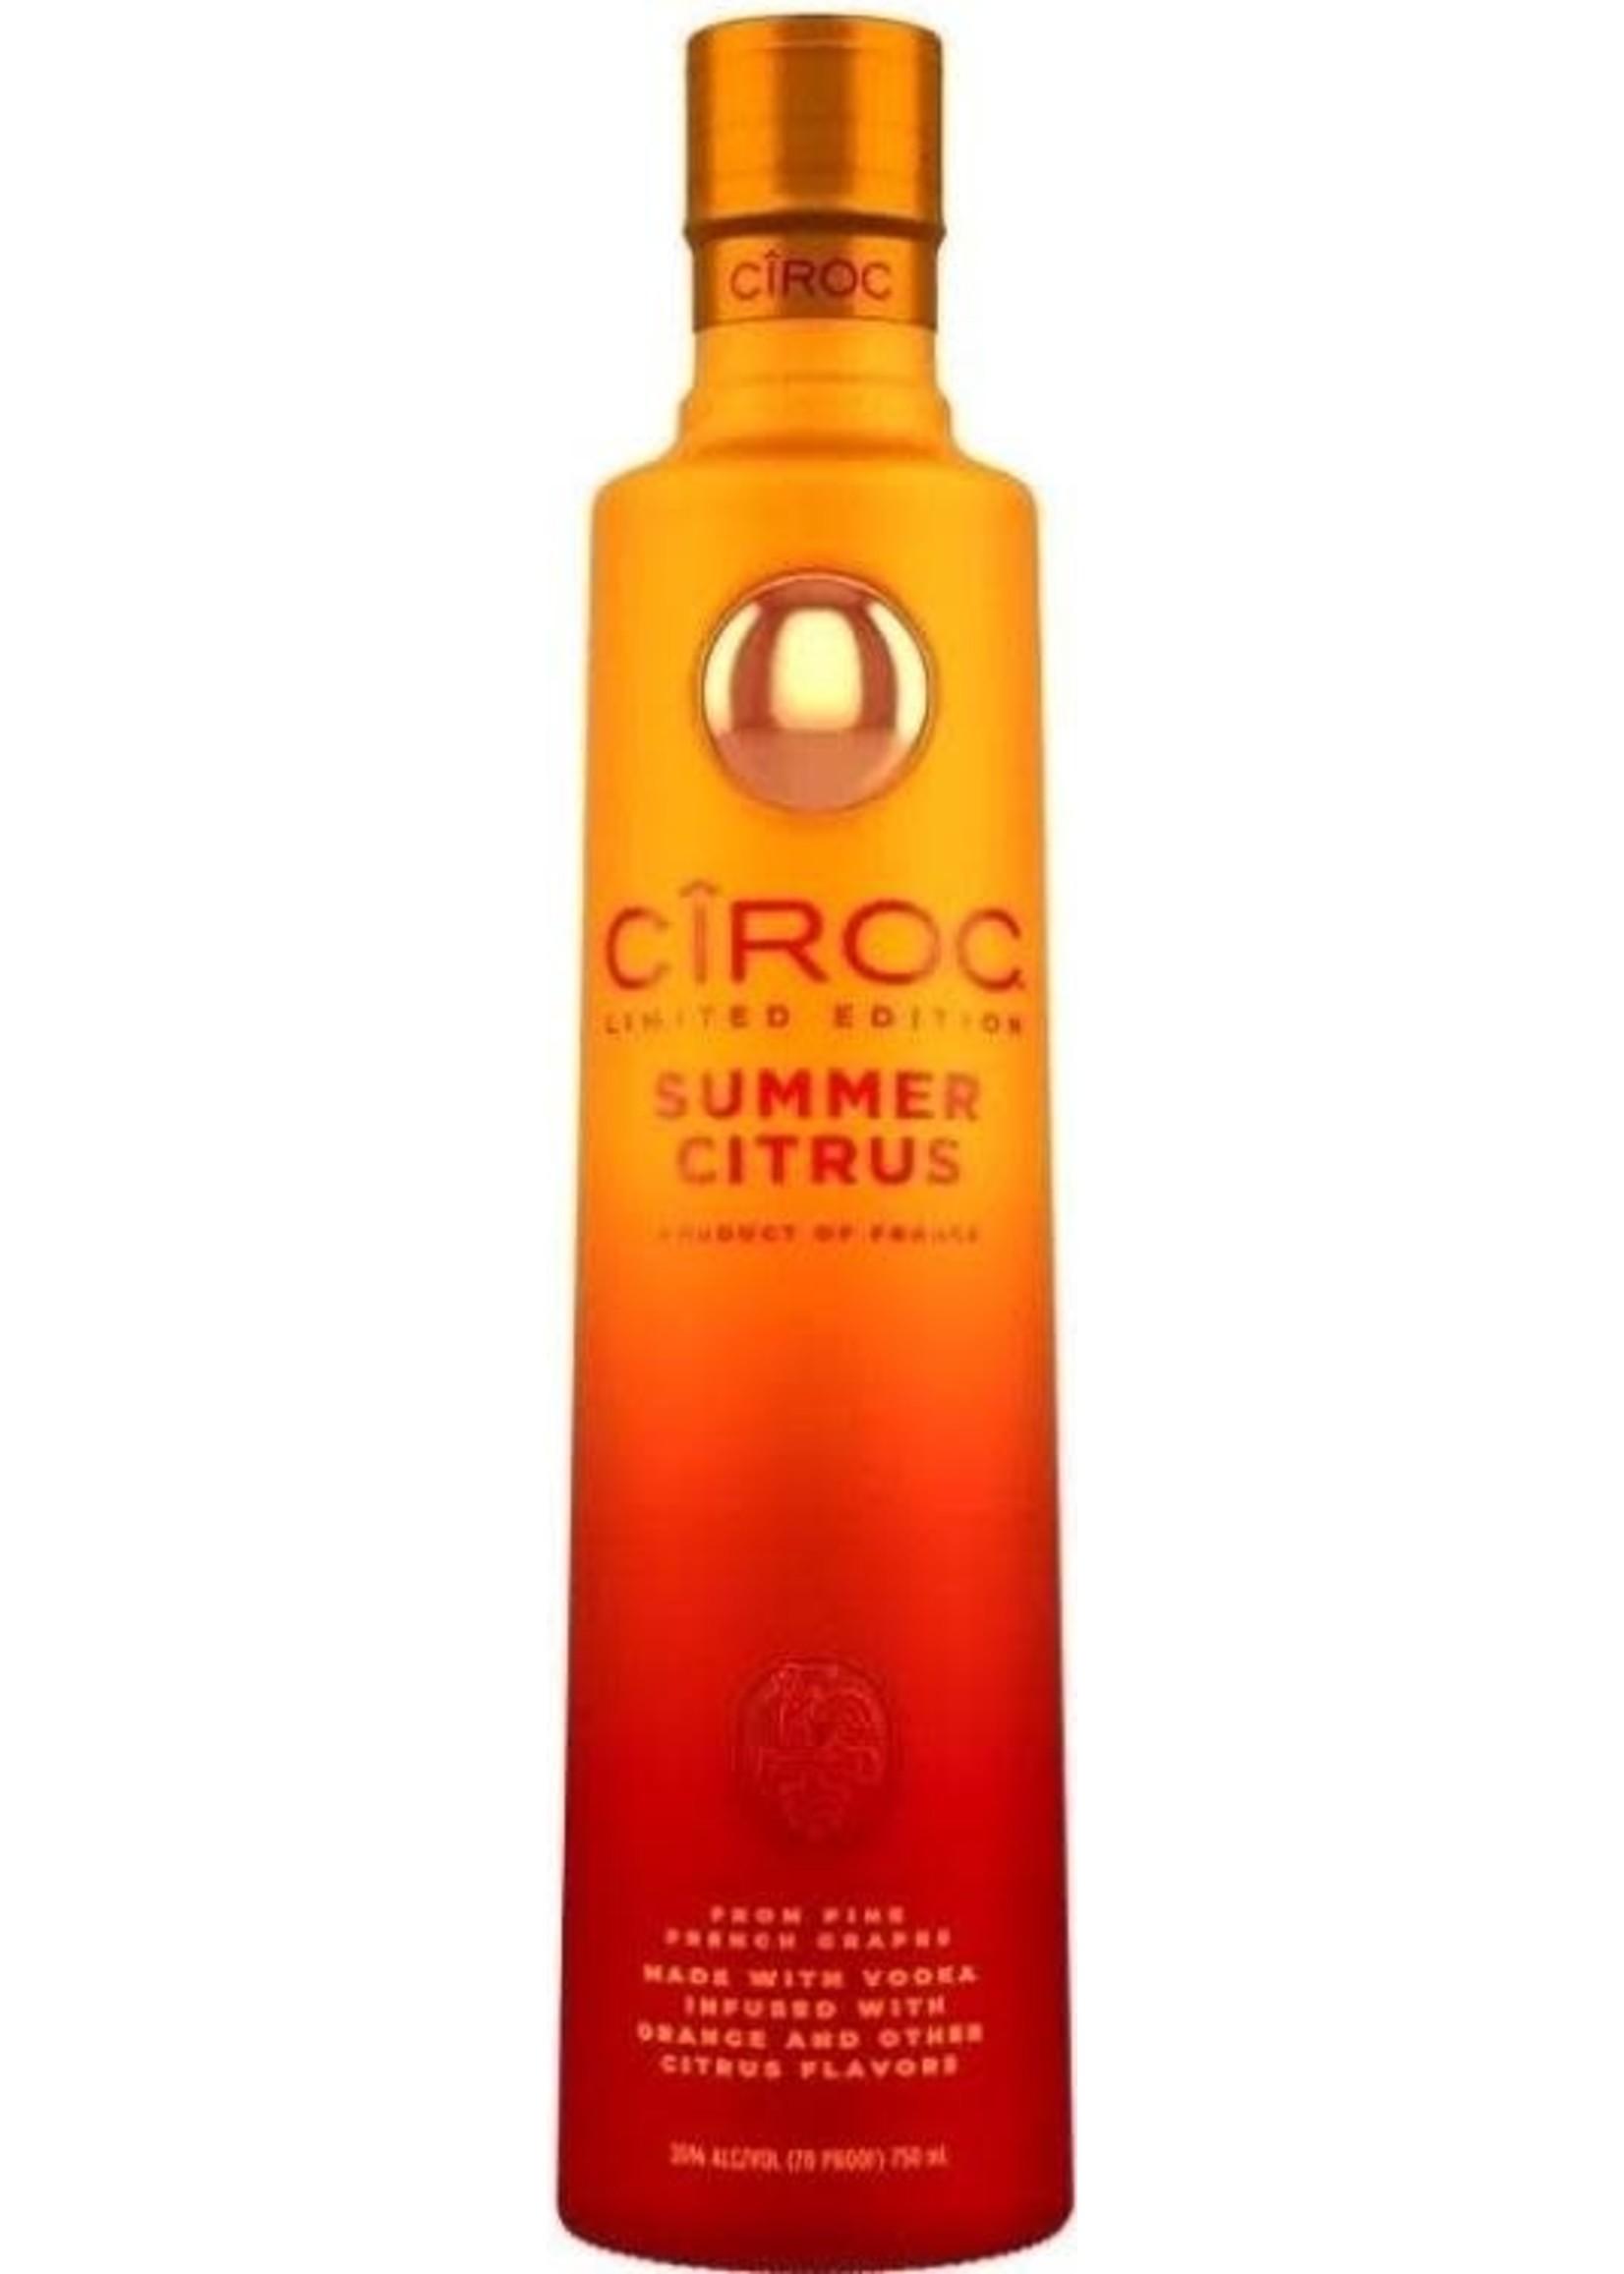 Ciroc Ciroc / Vodka Summer Citrus / 750mL